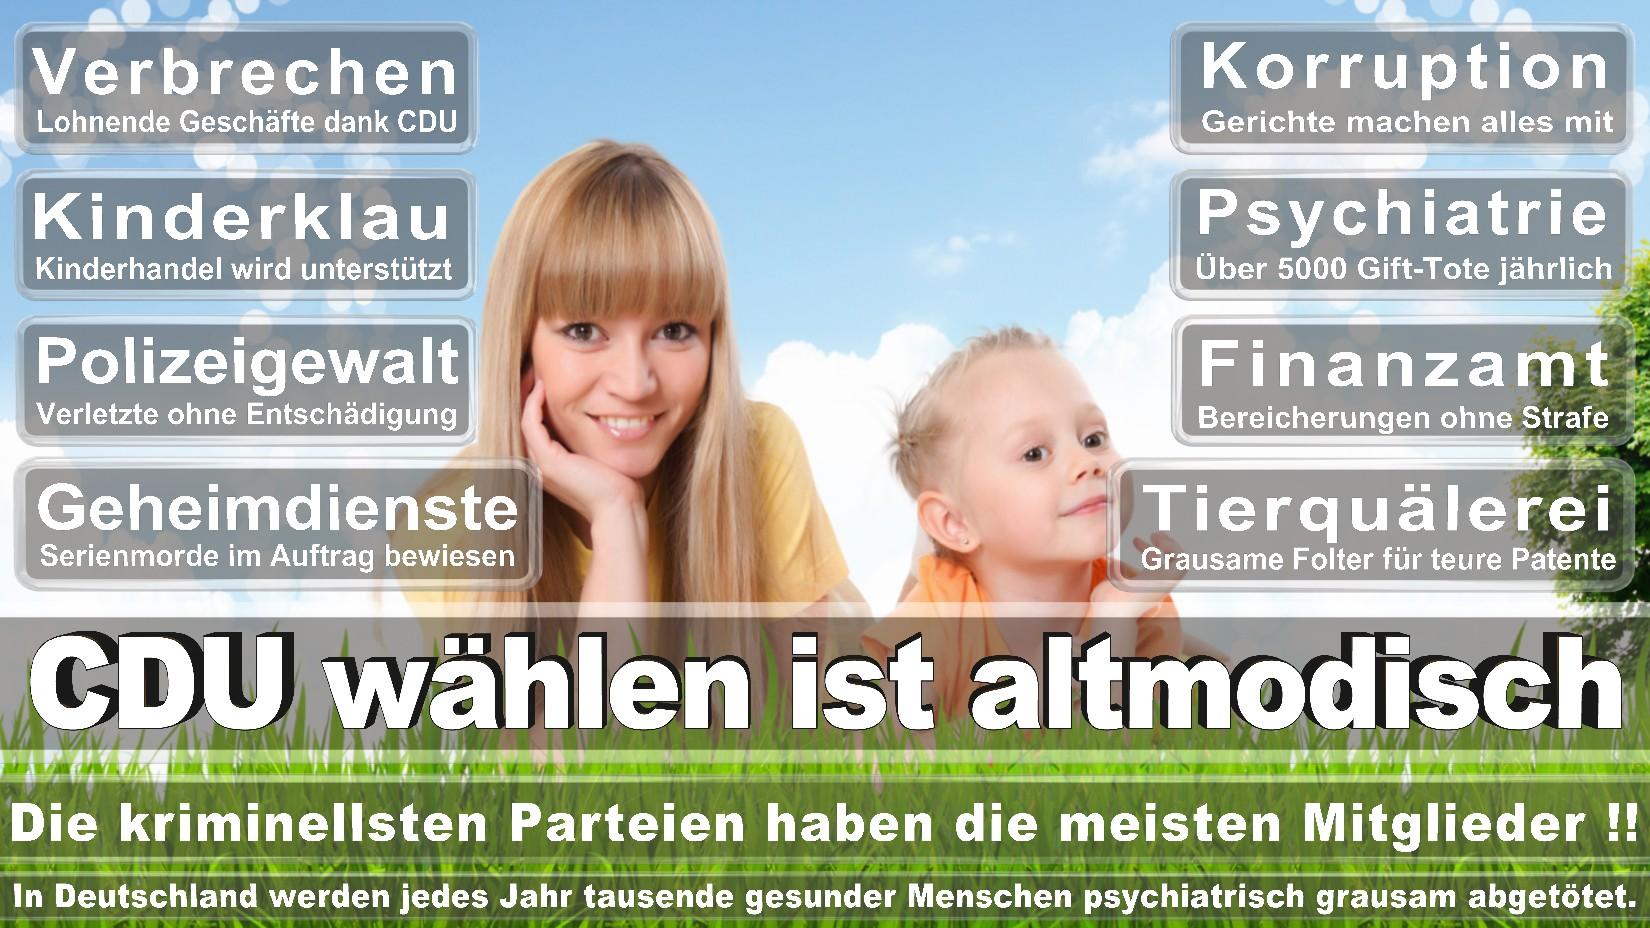 Angela-Merkel-CDU (16)